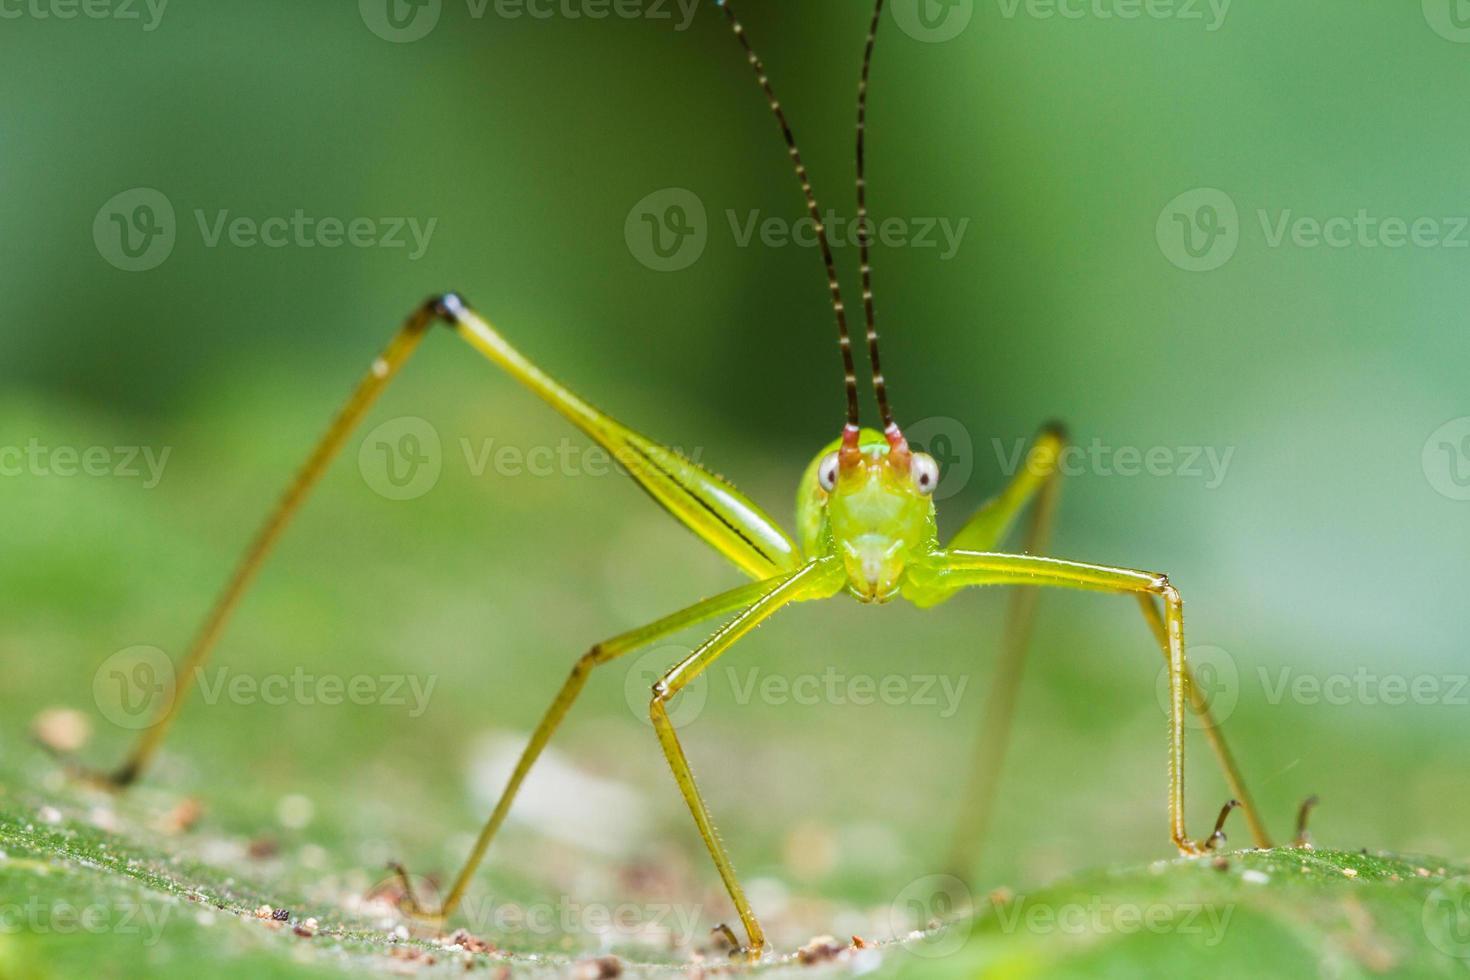 pequeña hoja verde saltamontes foto